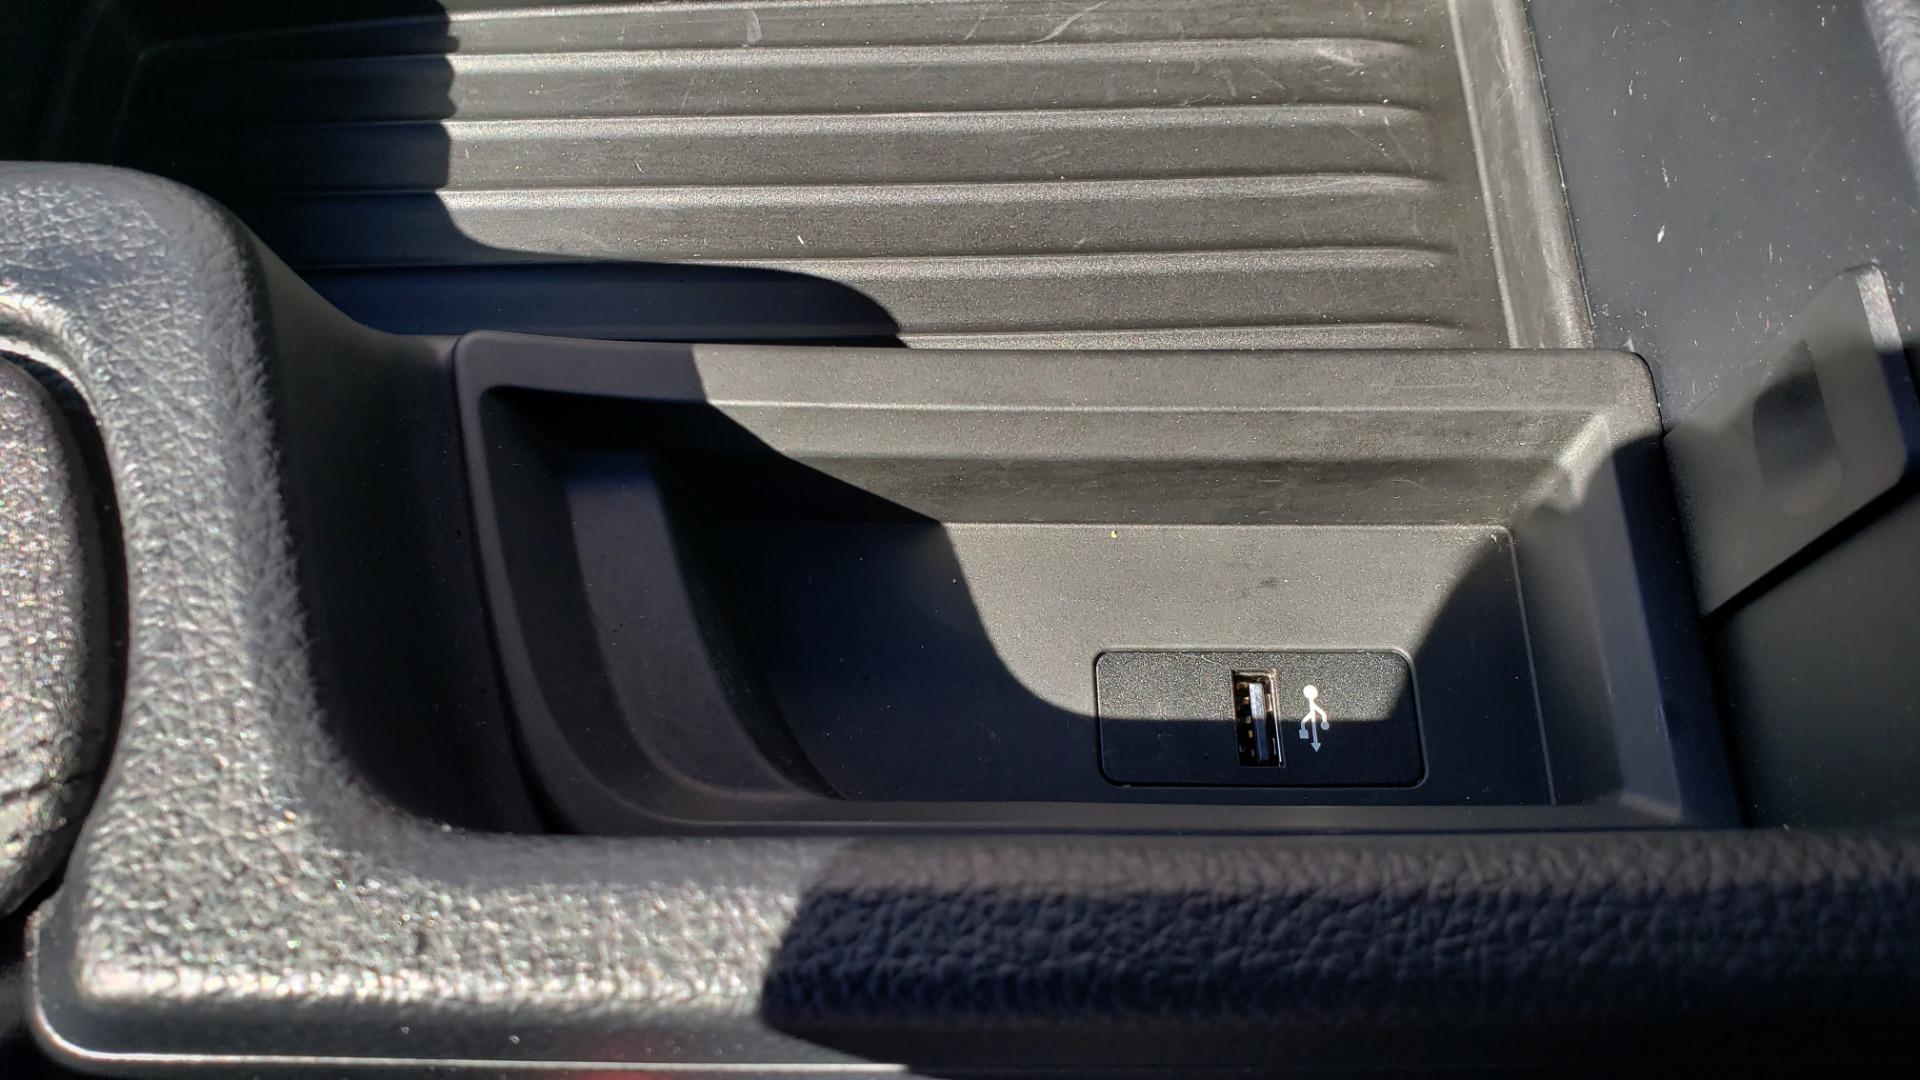 Used 2018 BMW 4 SERIES 430IXDRIVE / PREMIUM / NAV / SUNROOF / ESSENTIALS PKG for sale $28,995 at Formula Imports in Charlotte NC 28227 59